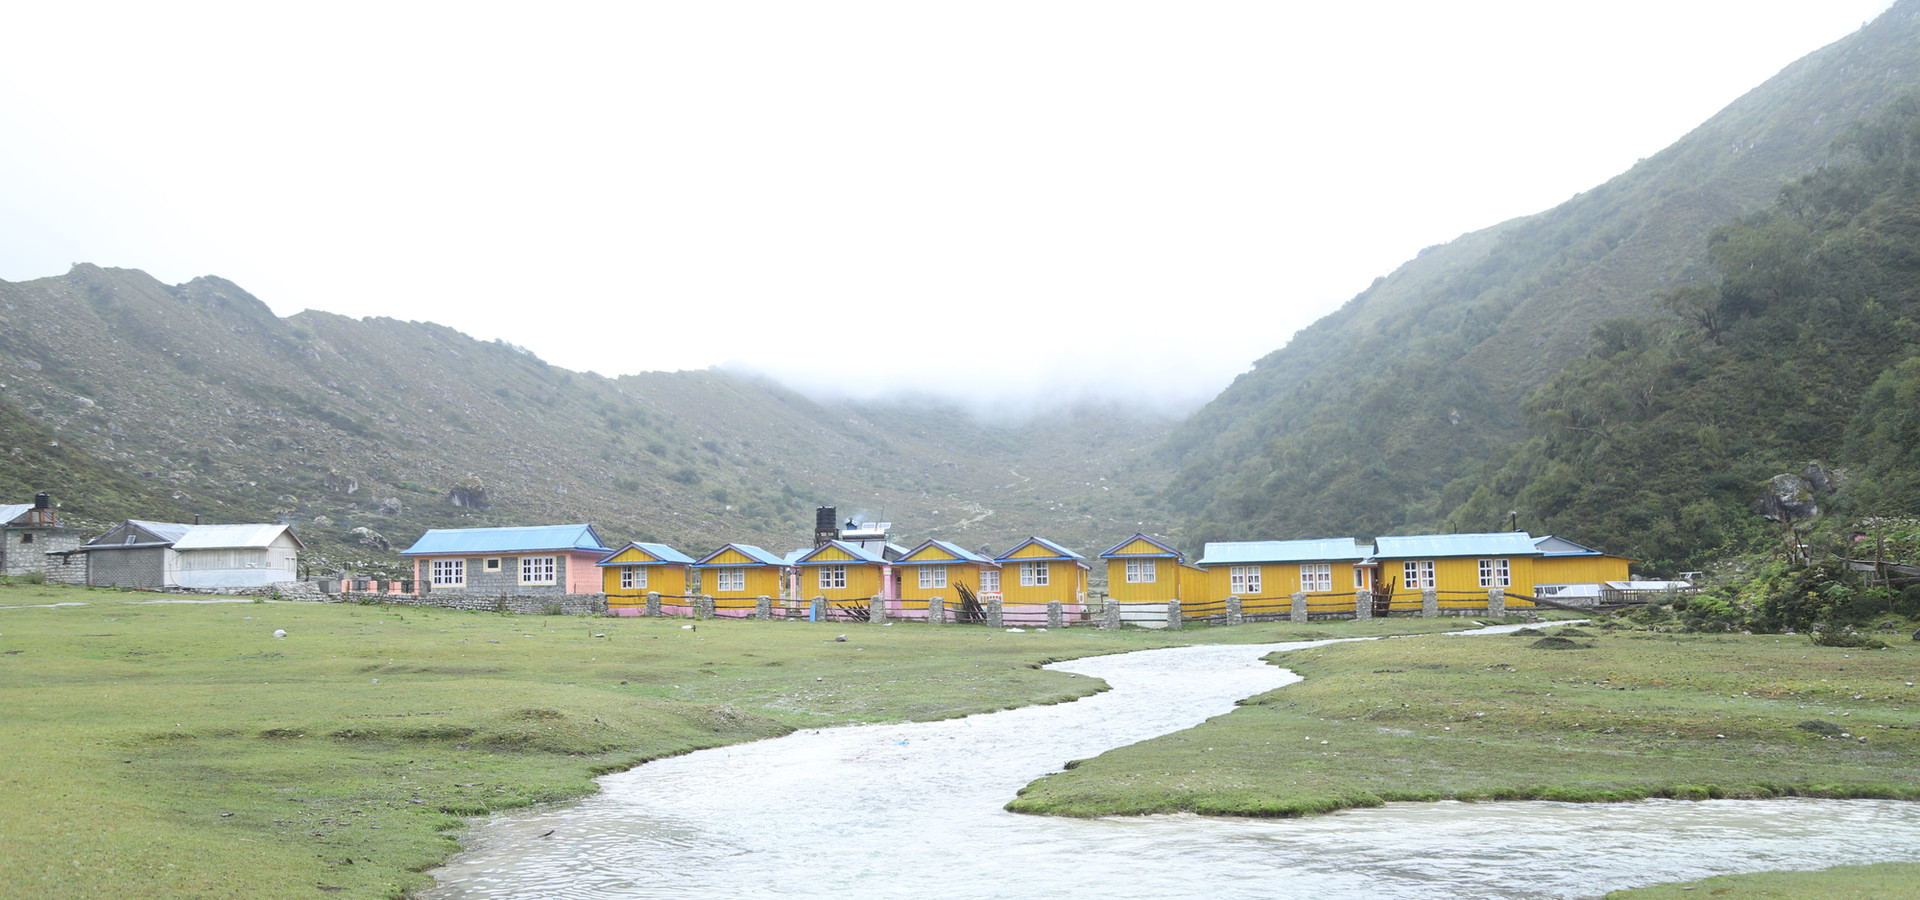 Bhimtang